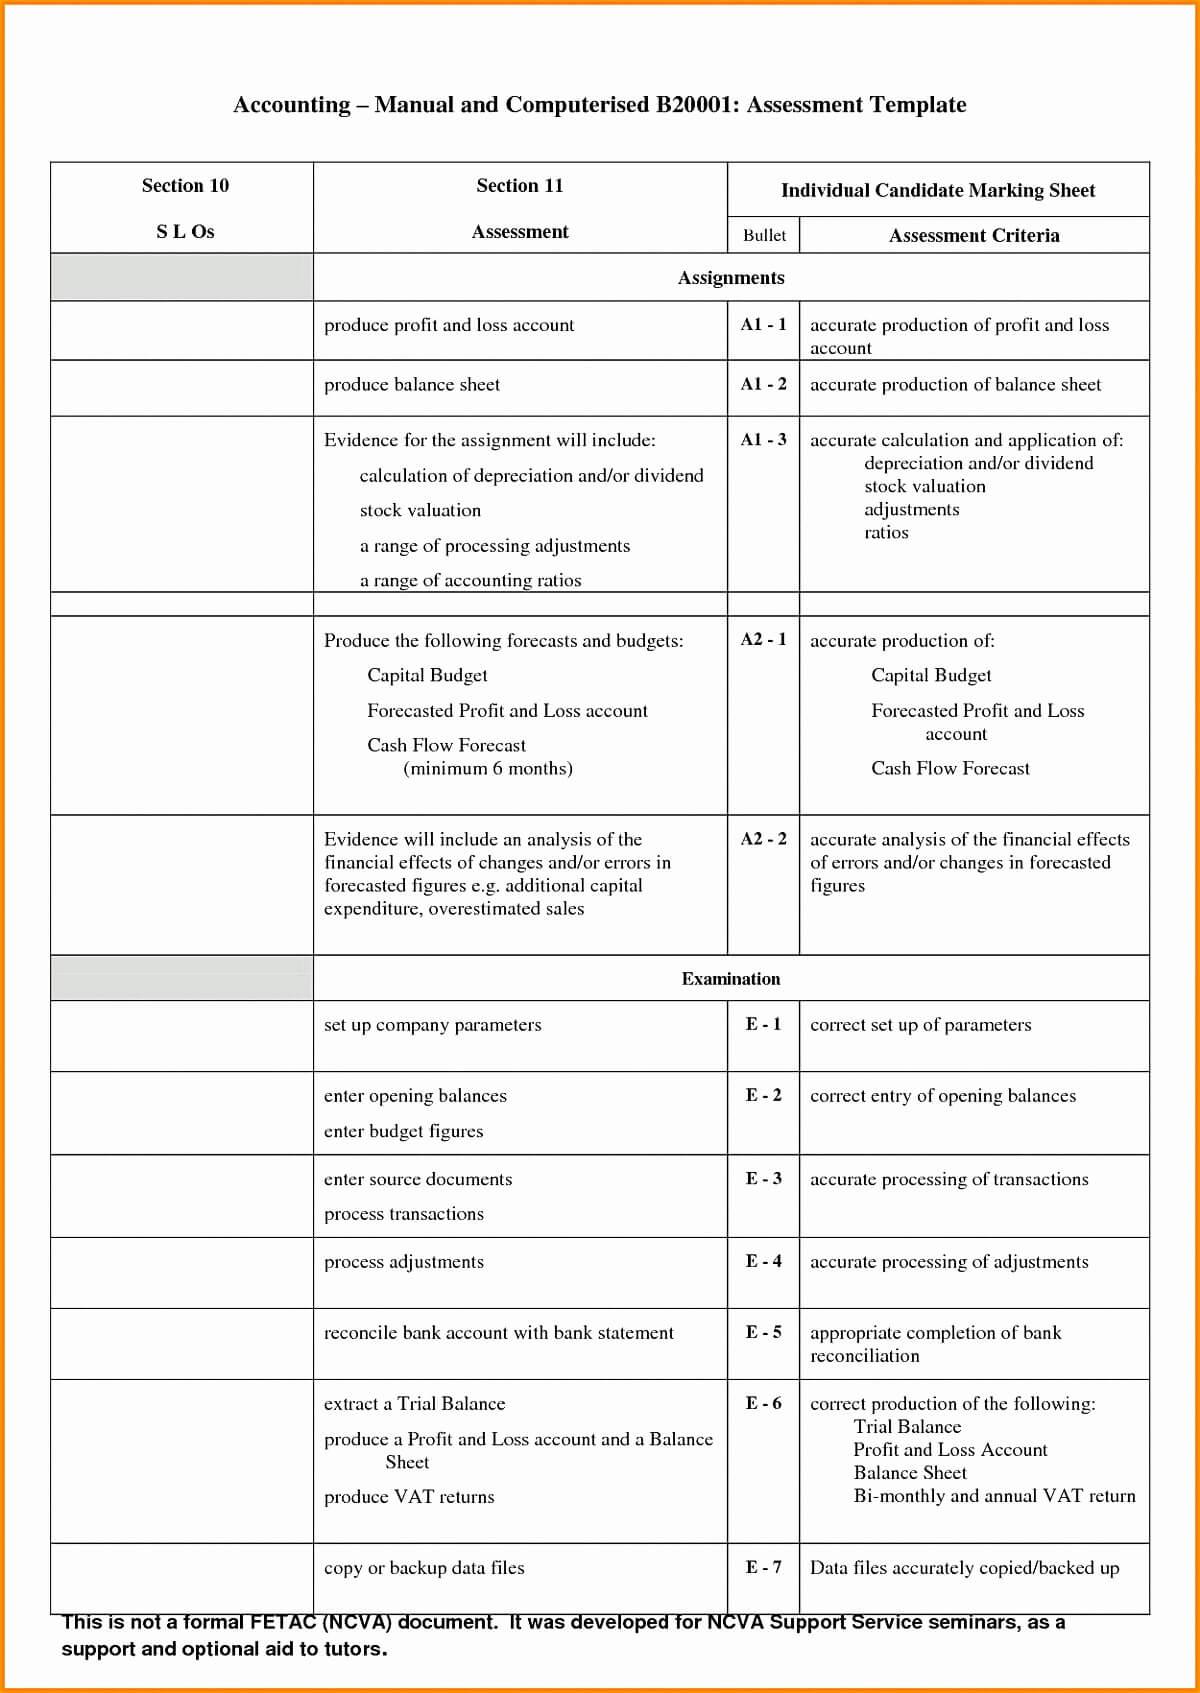 Business Valuation Report Template Worksheet Model Xls Small For Business Valuation Report Template Worksheet